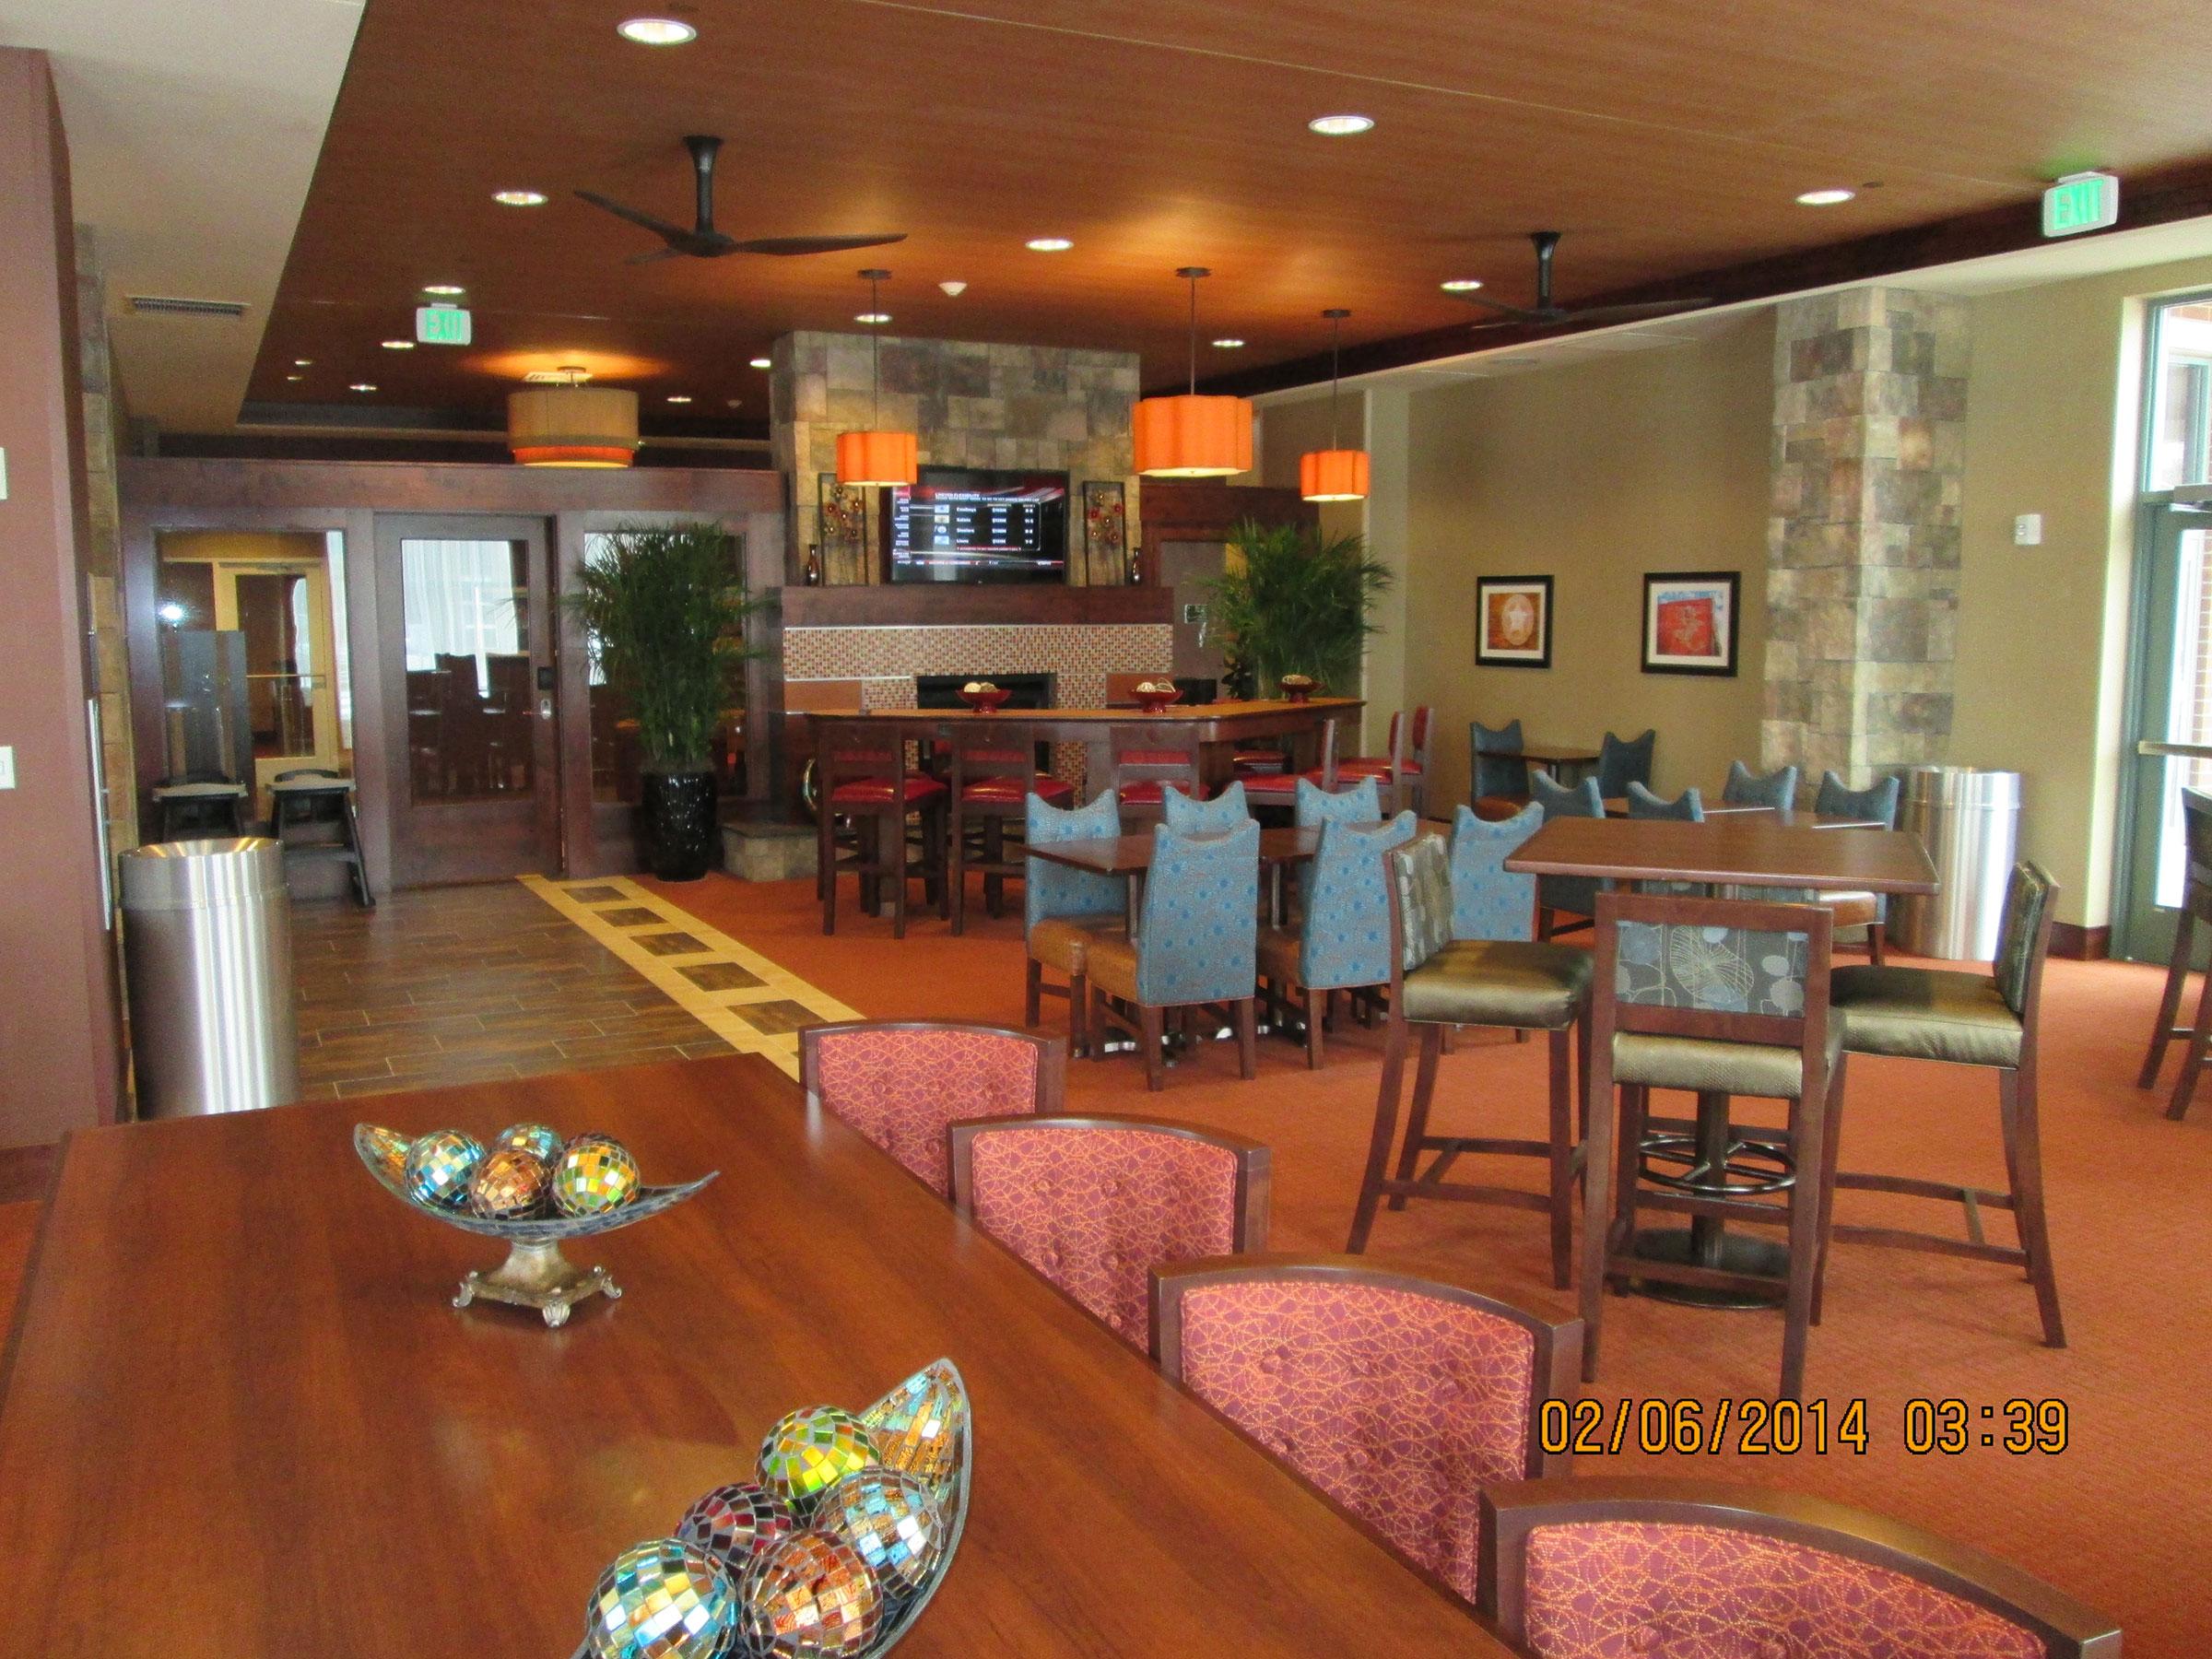 Hilton Garden Inn / Homewood Suites – OKC, OK   GBA Architecture and ...